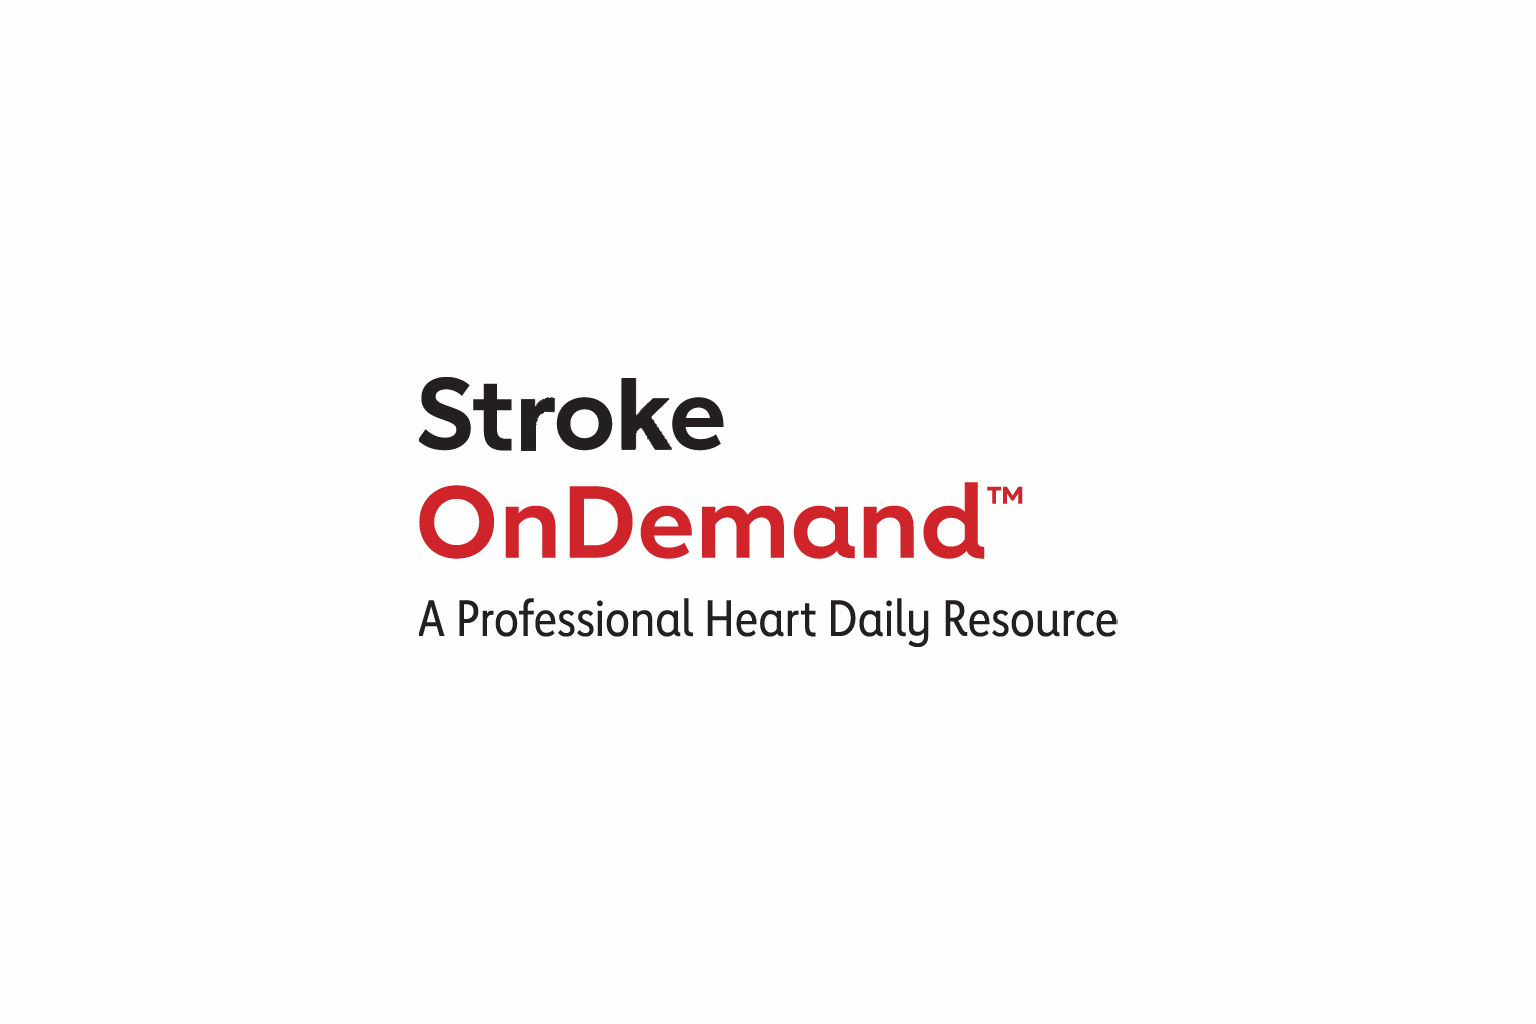 AHA Stroke OnDemand logo